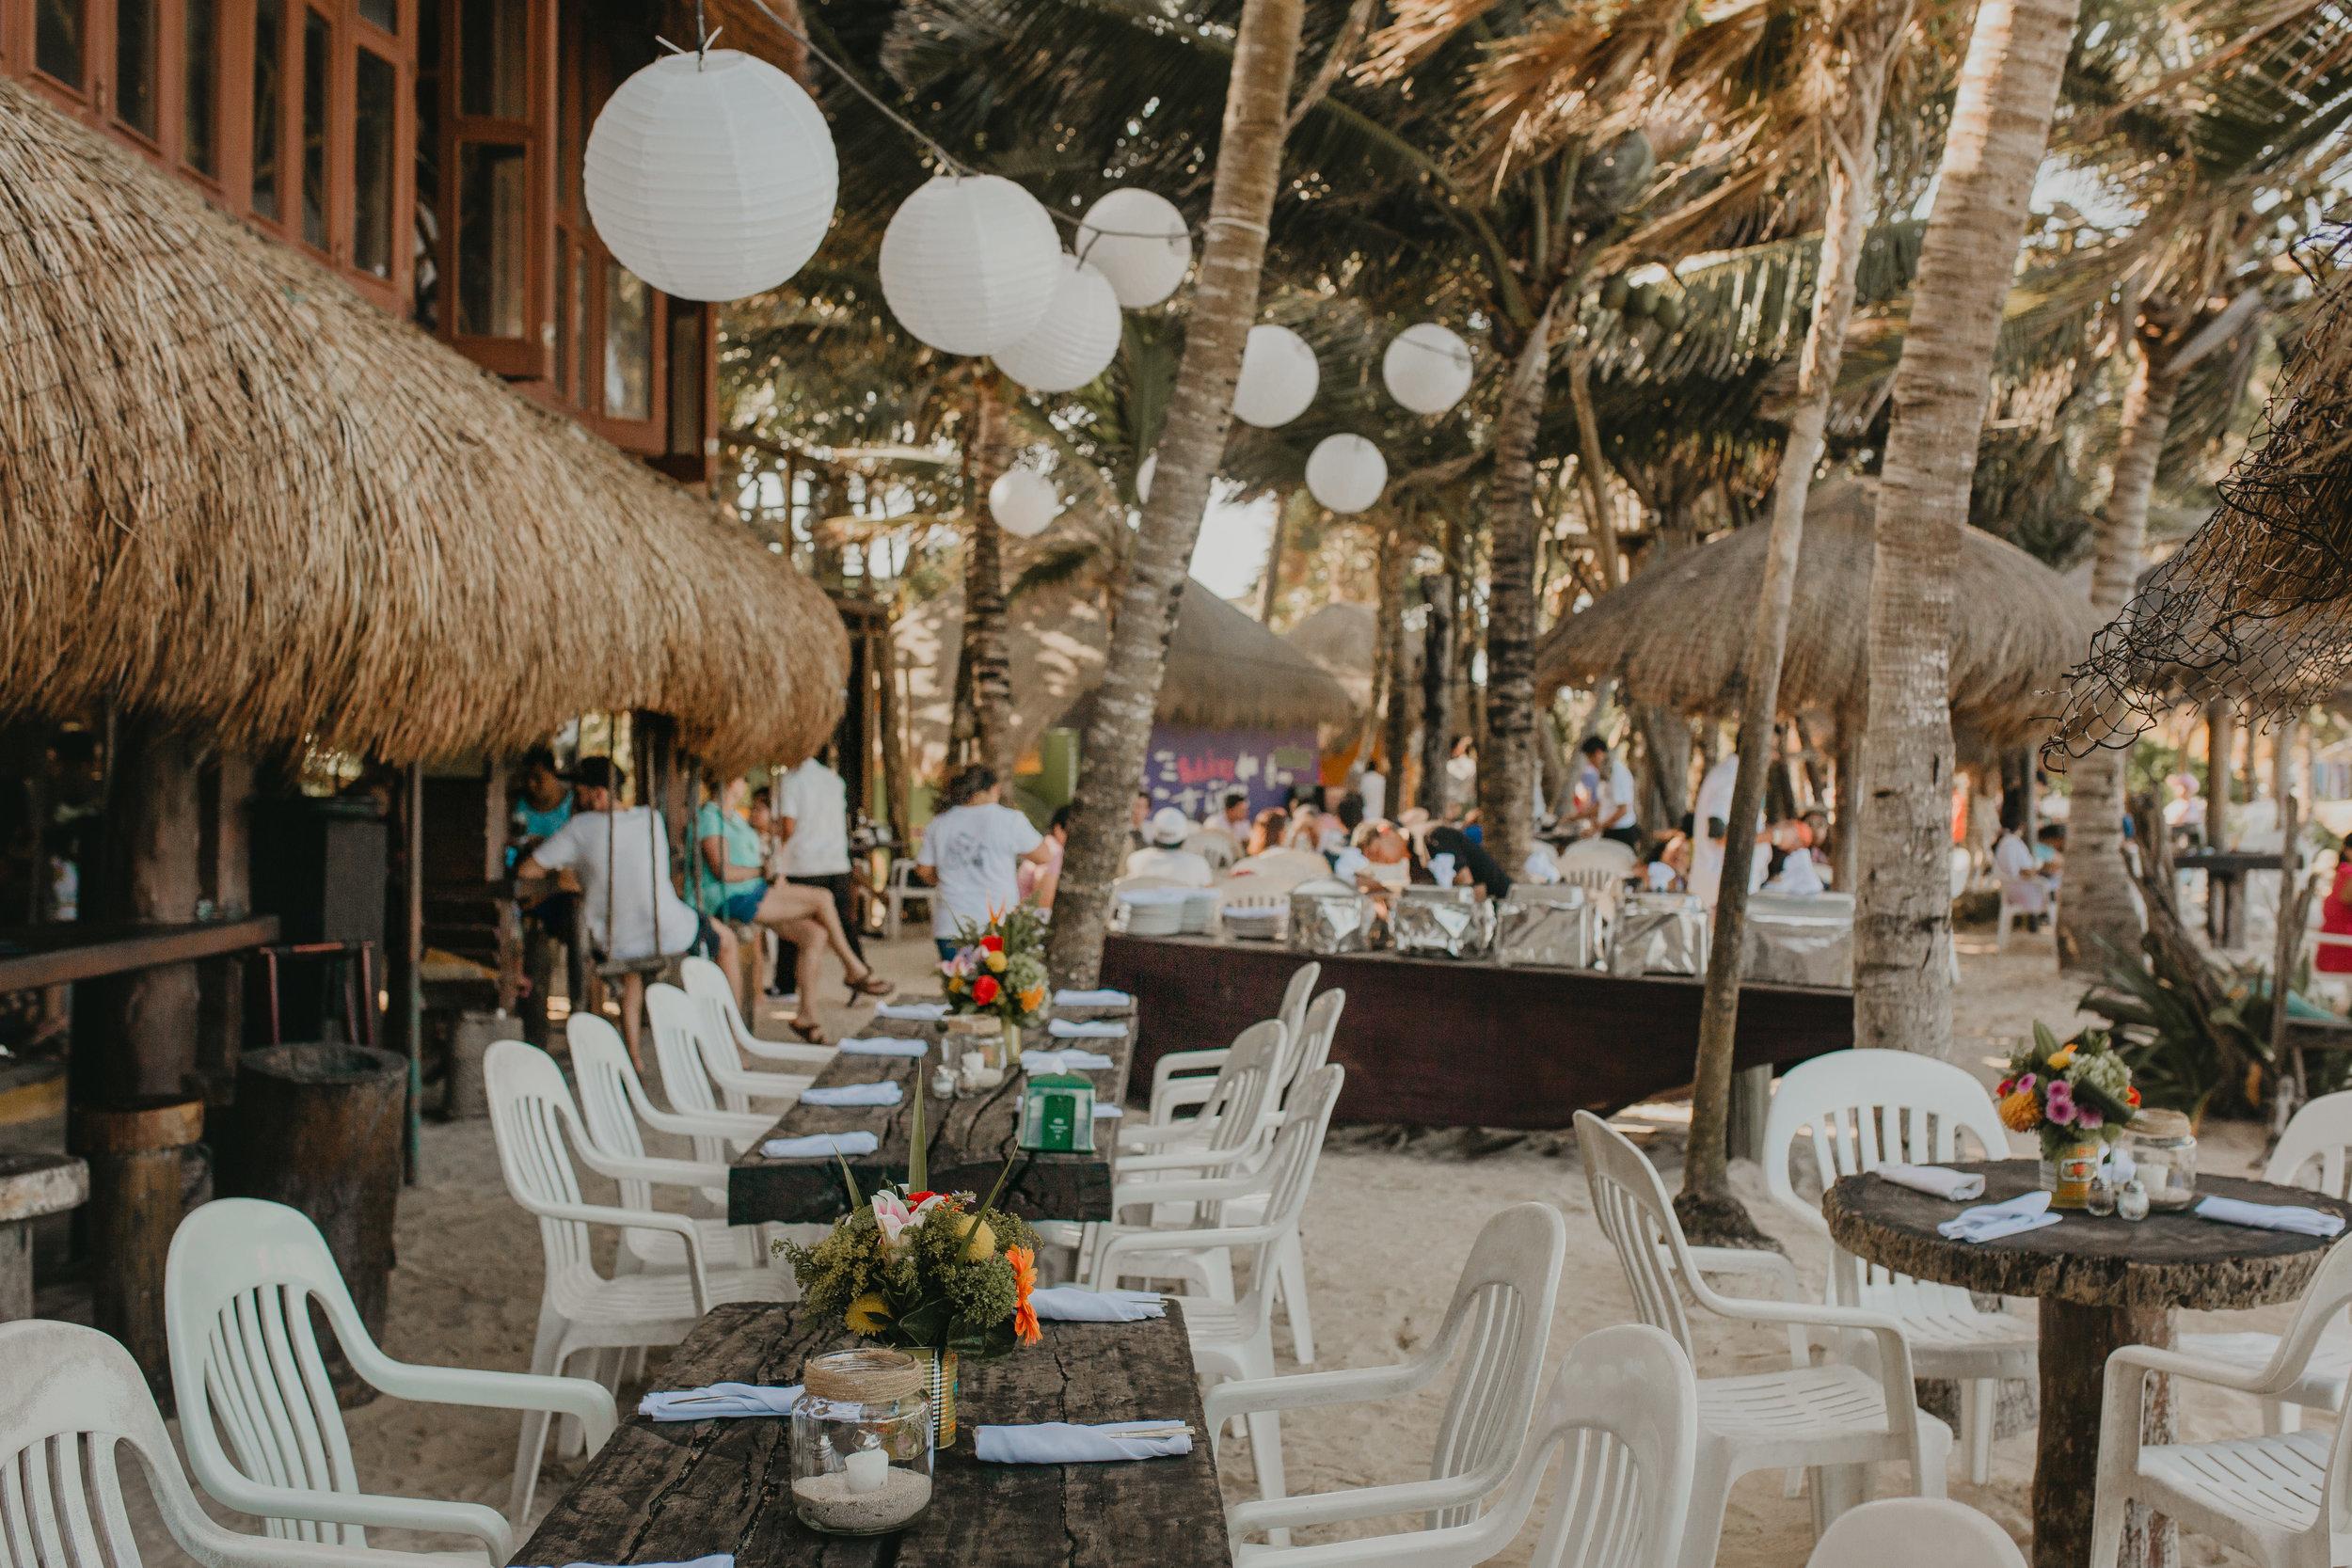 Nicole-Daacke-Photography-beachfront-akumal-destionation-wedding-tulum-mexico-elopement-photographer-destination-wedding-inspiration-sunset-champagne-pop-boho-bride-ocean-tropical-bohemian-tulum-wedding-photos-146.jpg